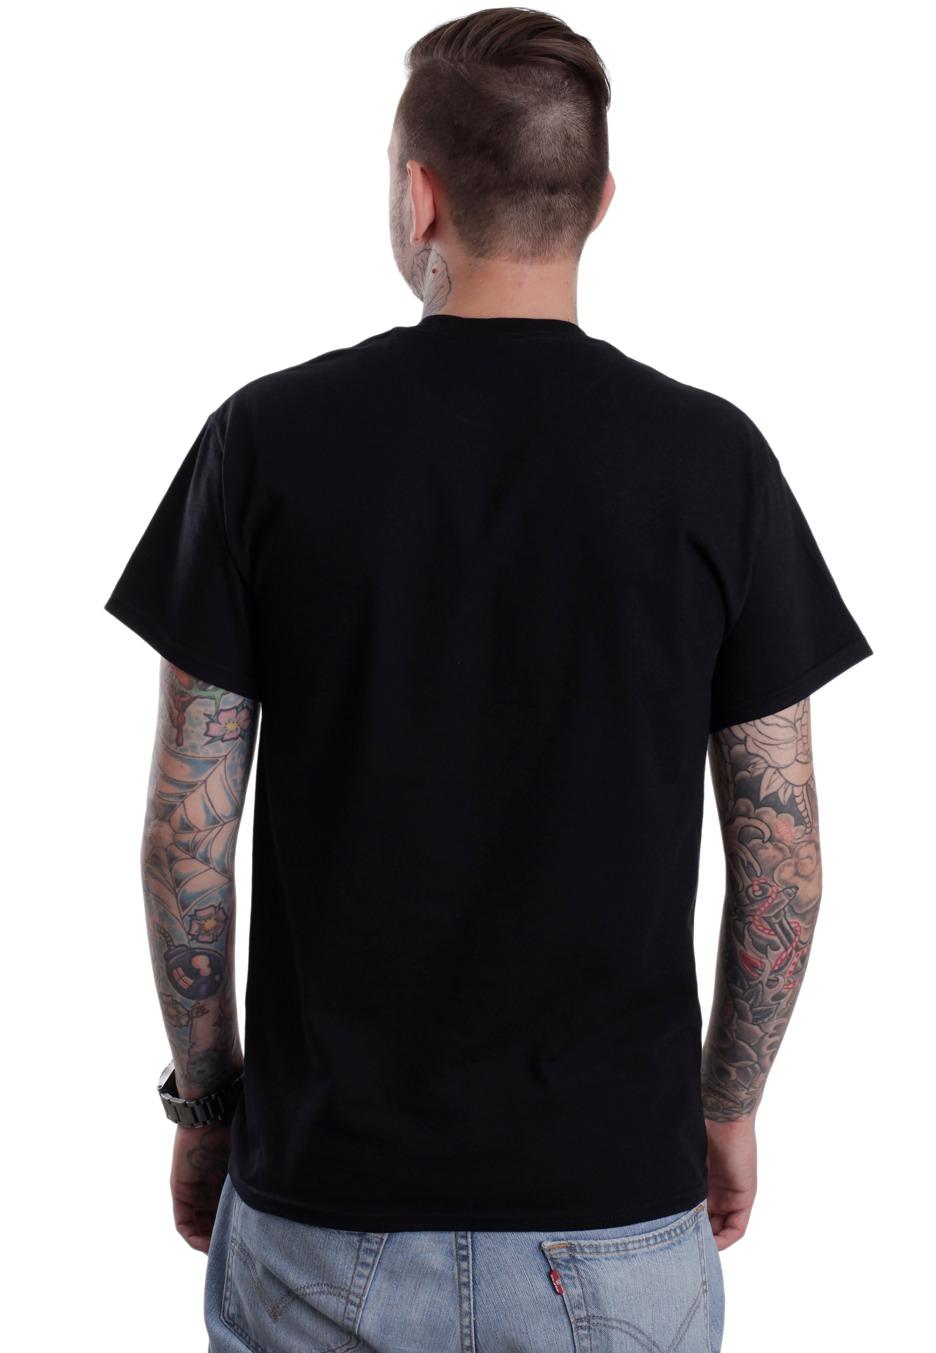 chelsea grin reaper t shirt official deathcore merchandise shop worldwide. Black Bedroom Furniture Sets. Home Design Ideas